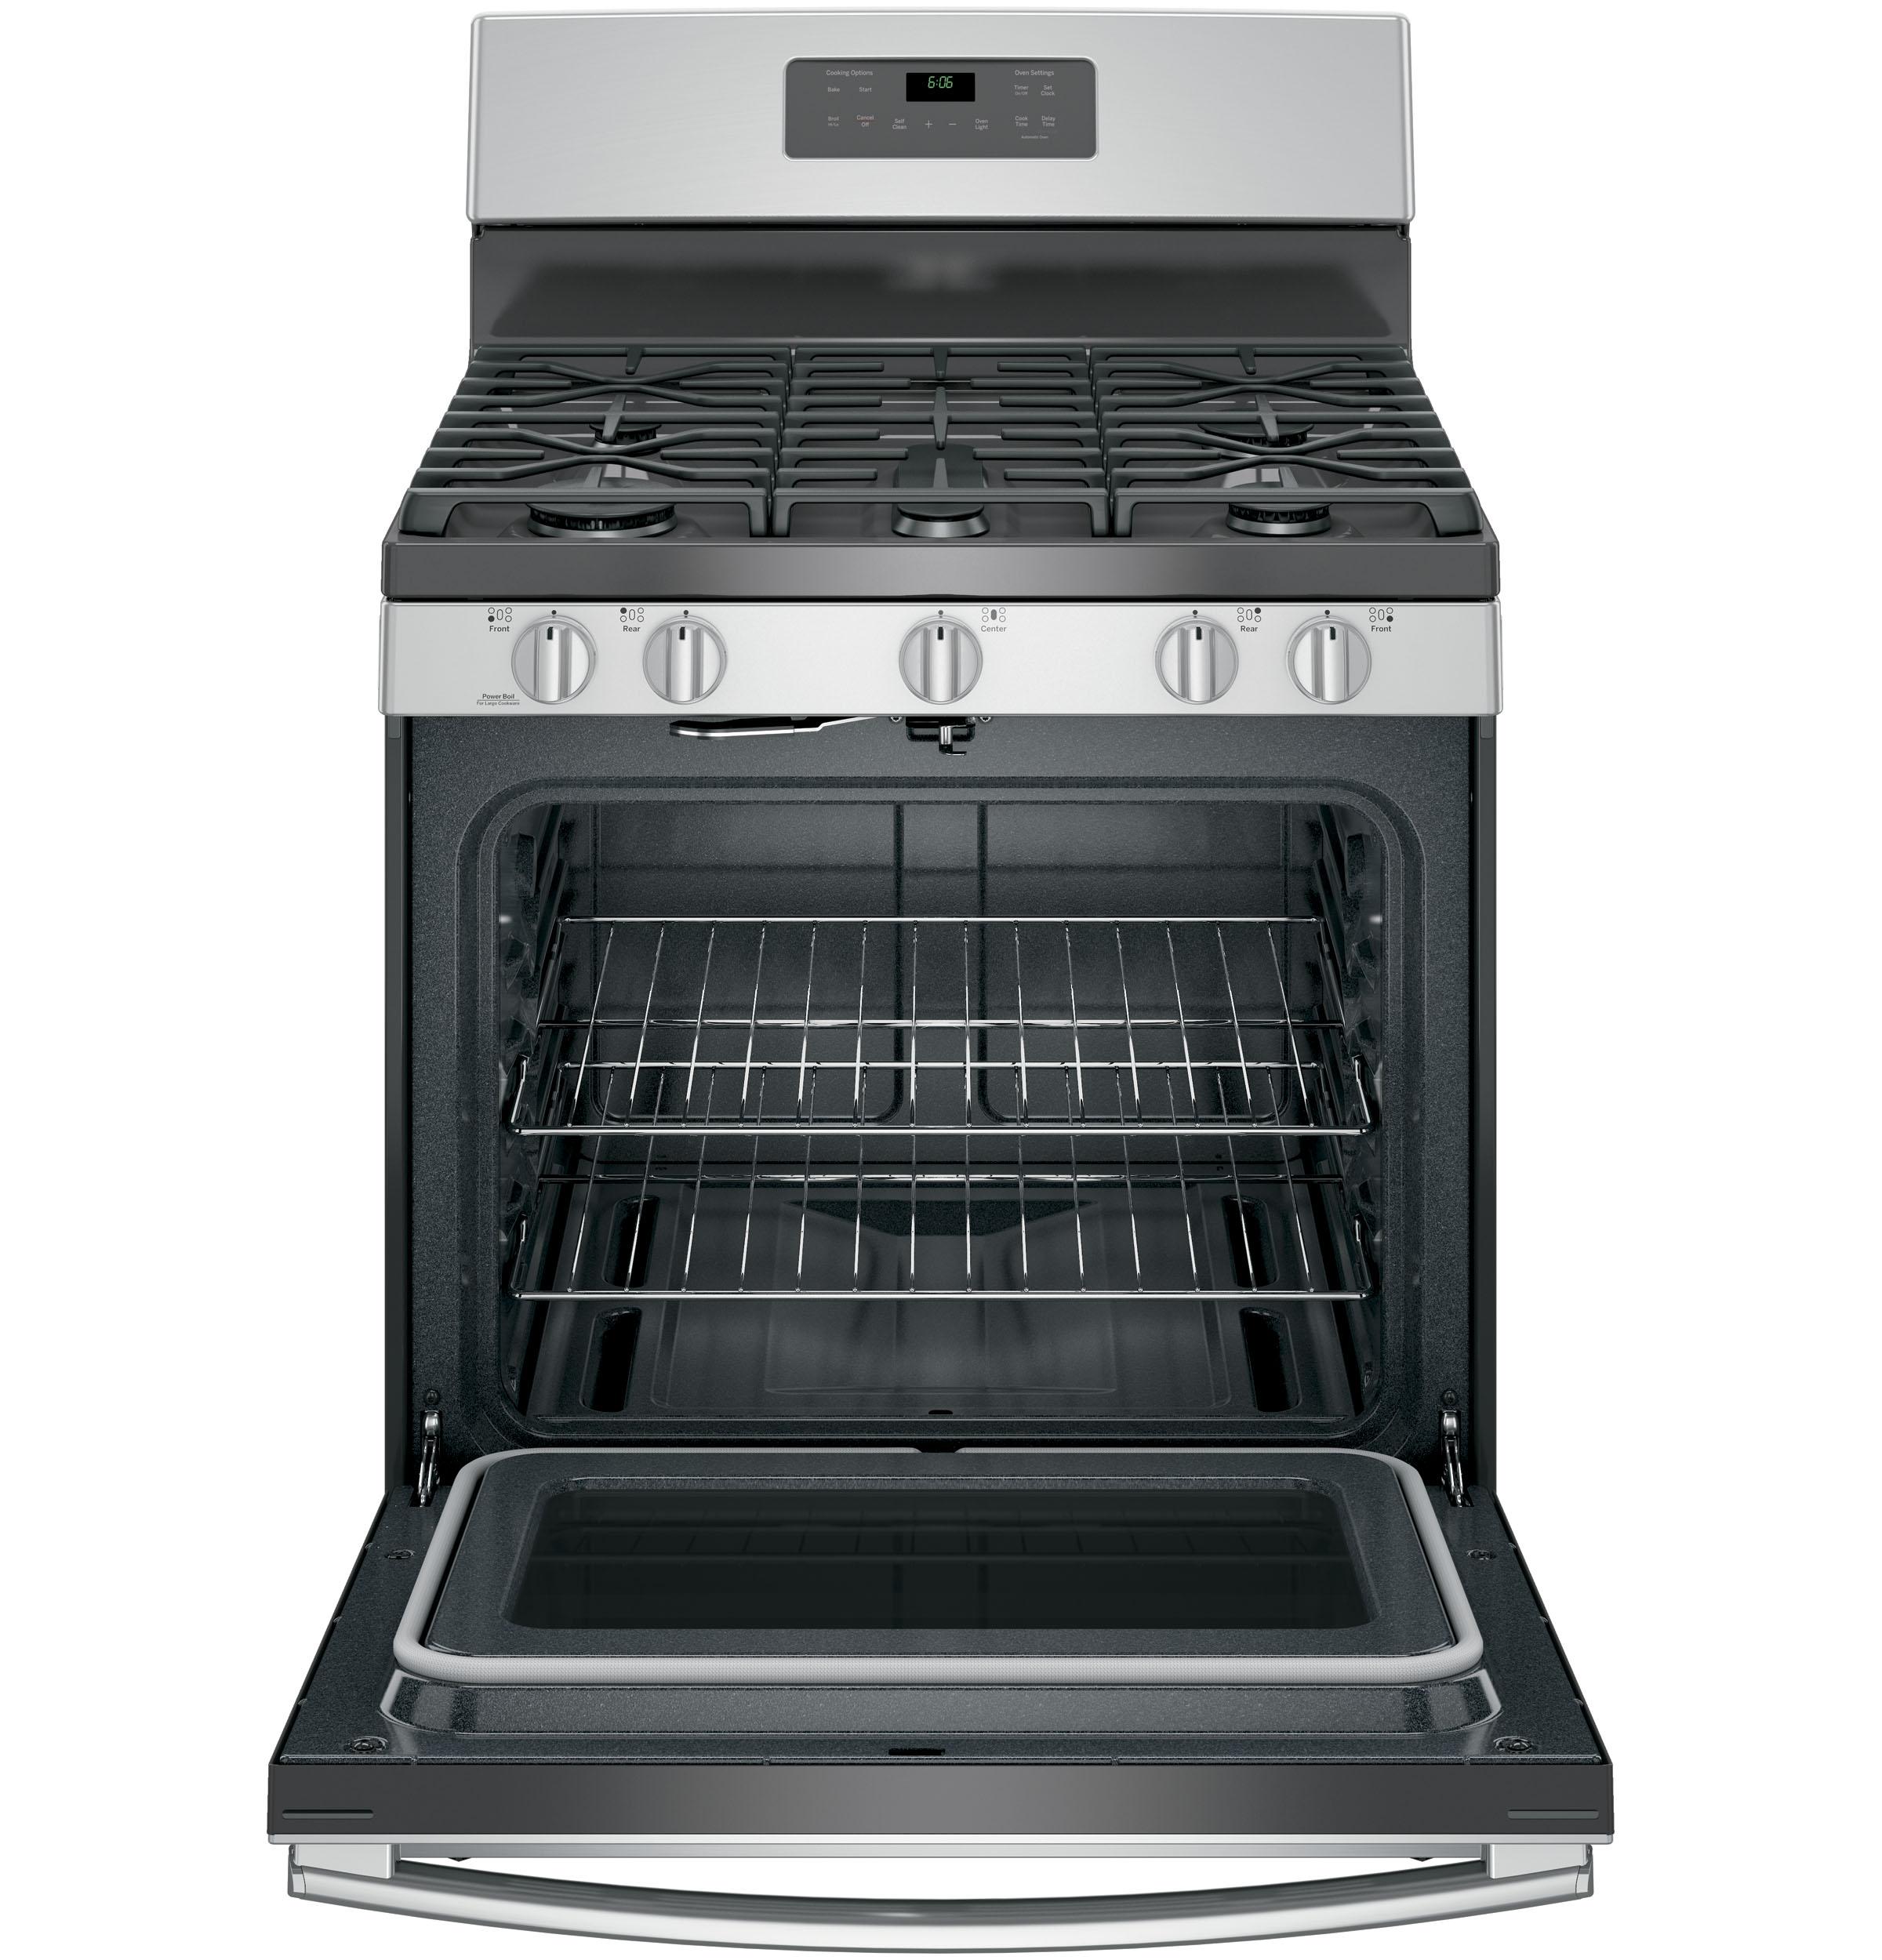 GE Appliances JGB660SEJSS 5.0 cu .ft. Freestanding Gas Range - Stainless Steel